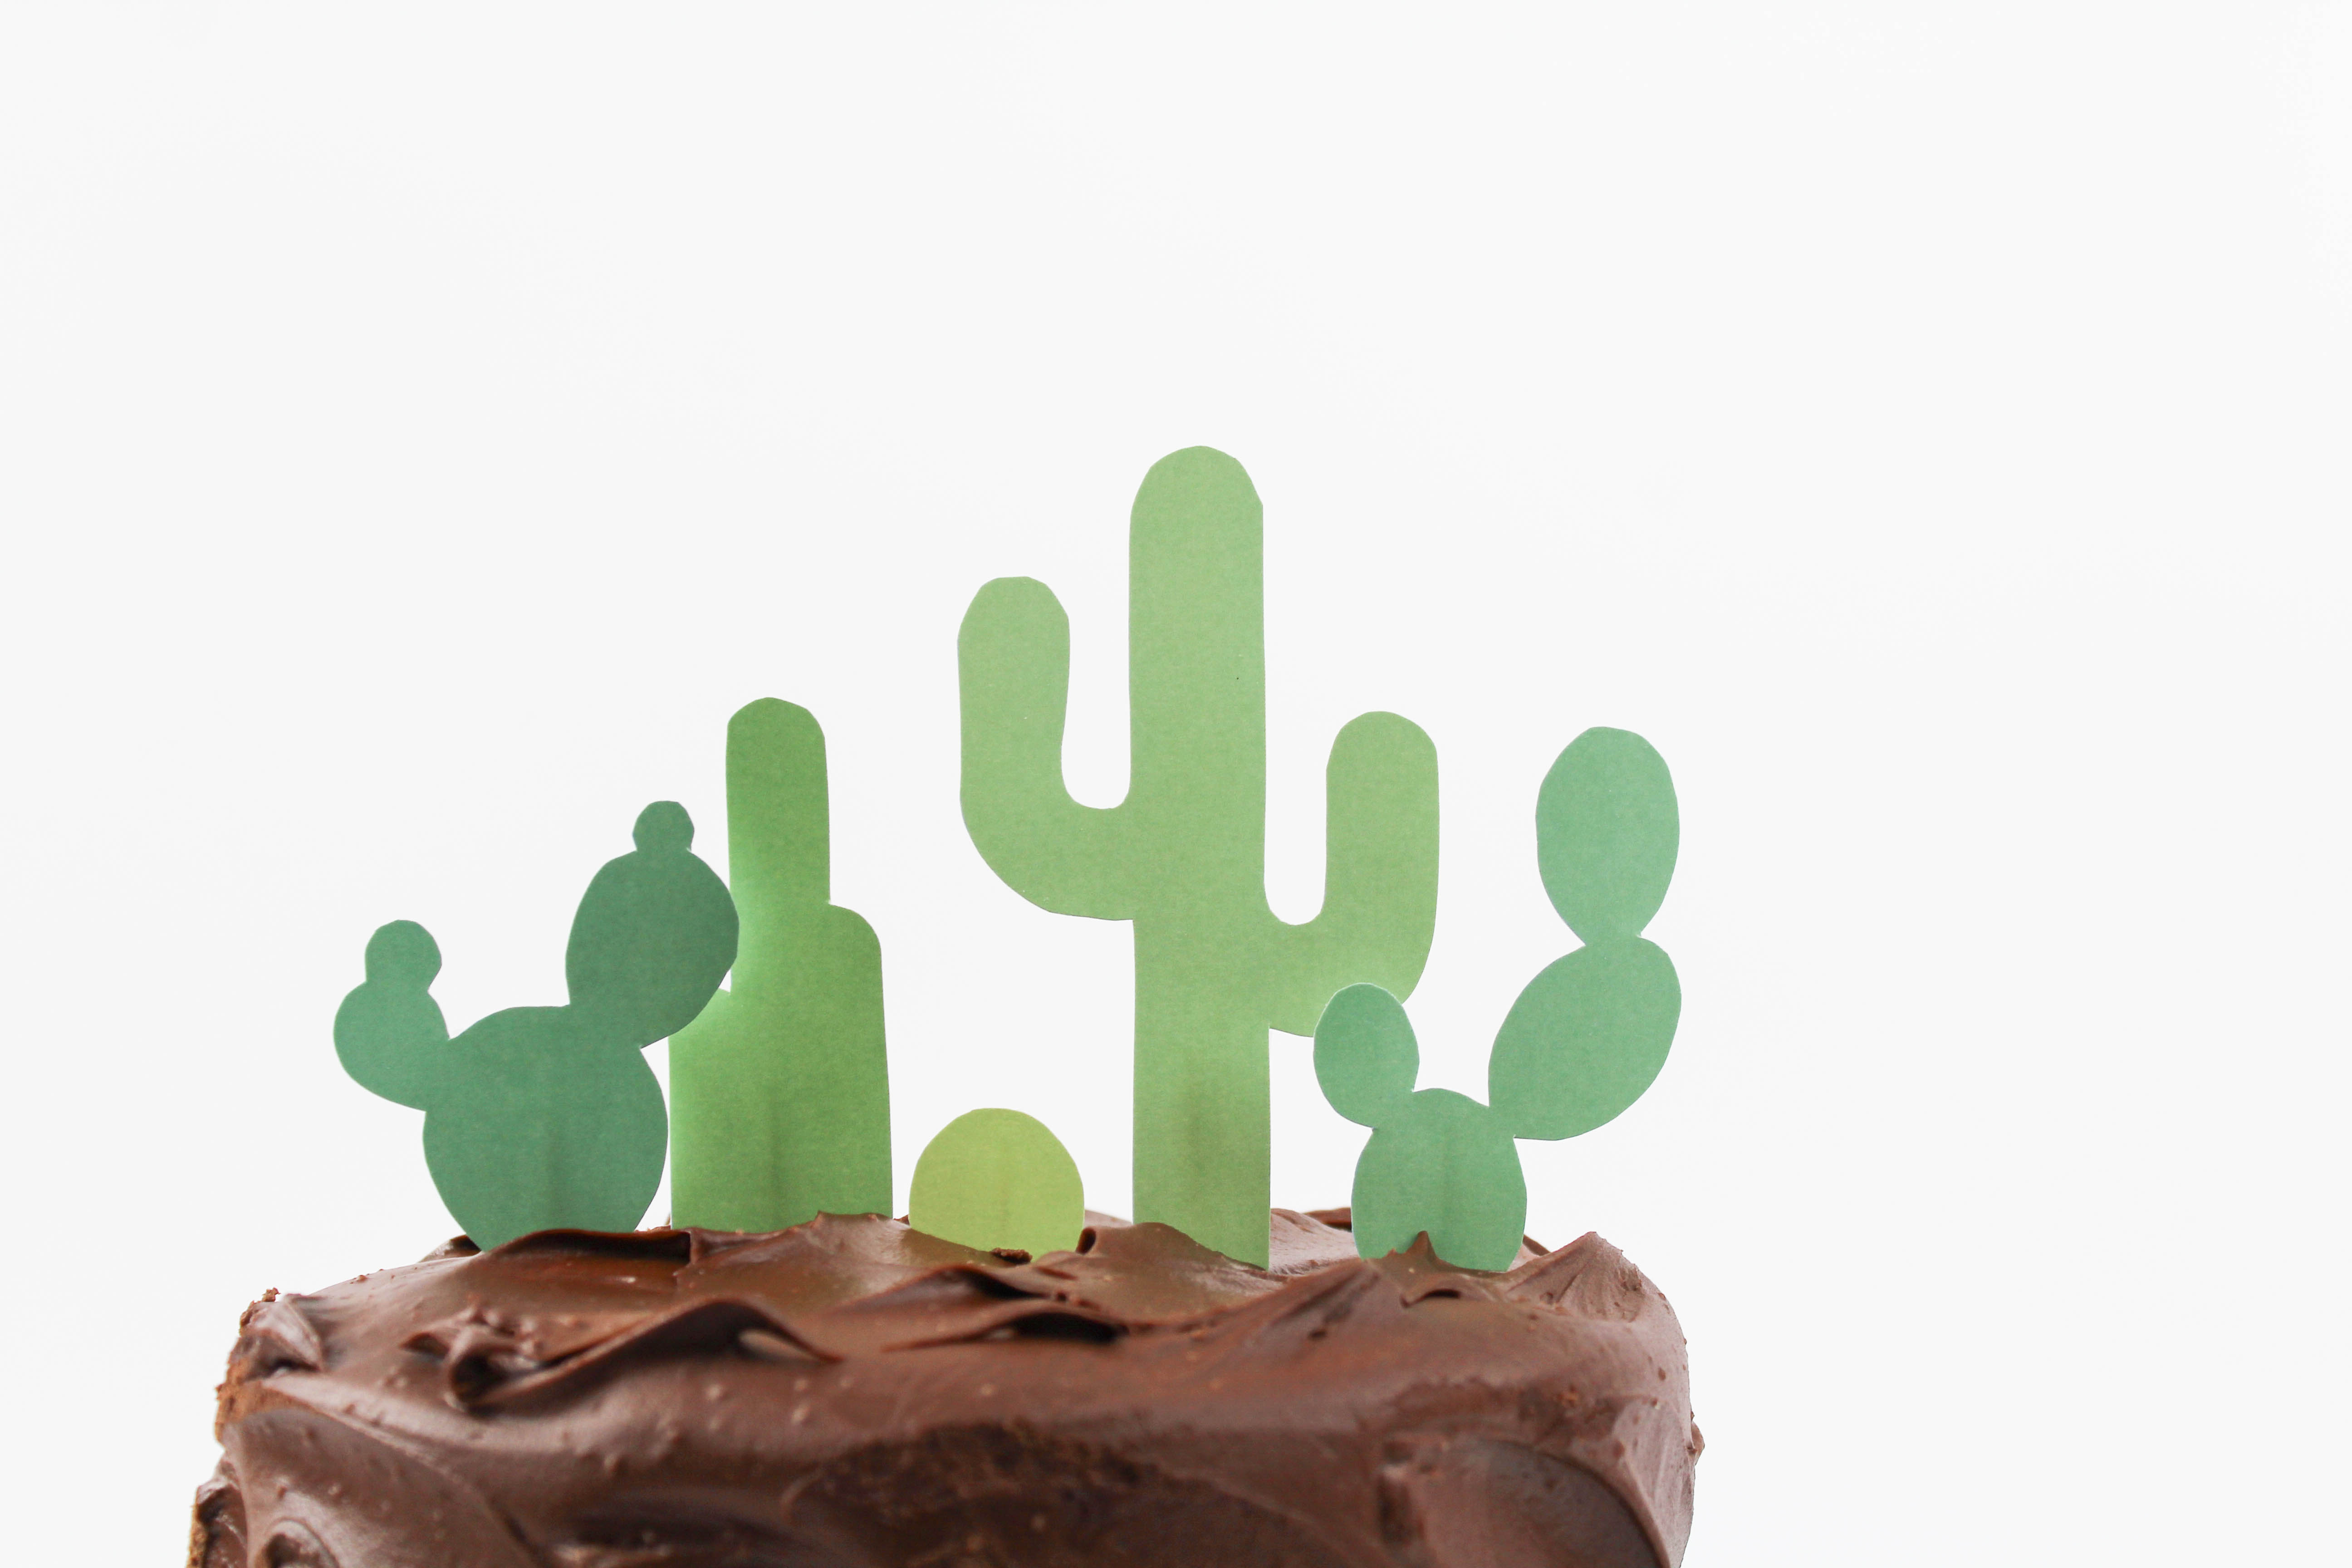 image about Cactus Printable known as Printable Cactus Cake Topper - Allows Mingle Weblog